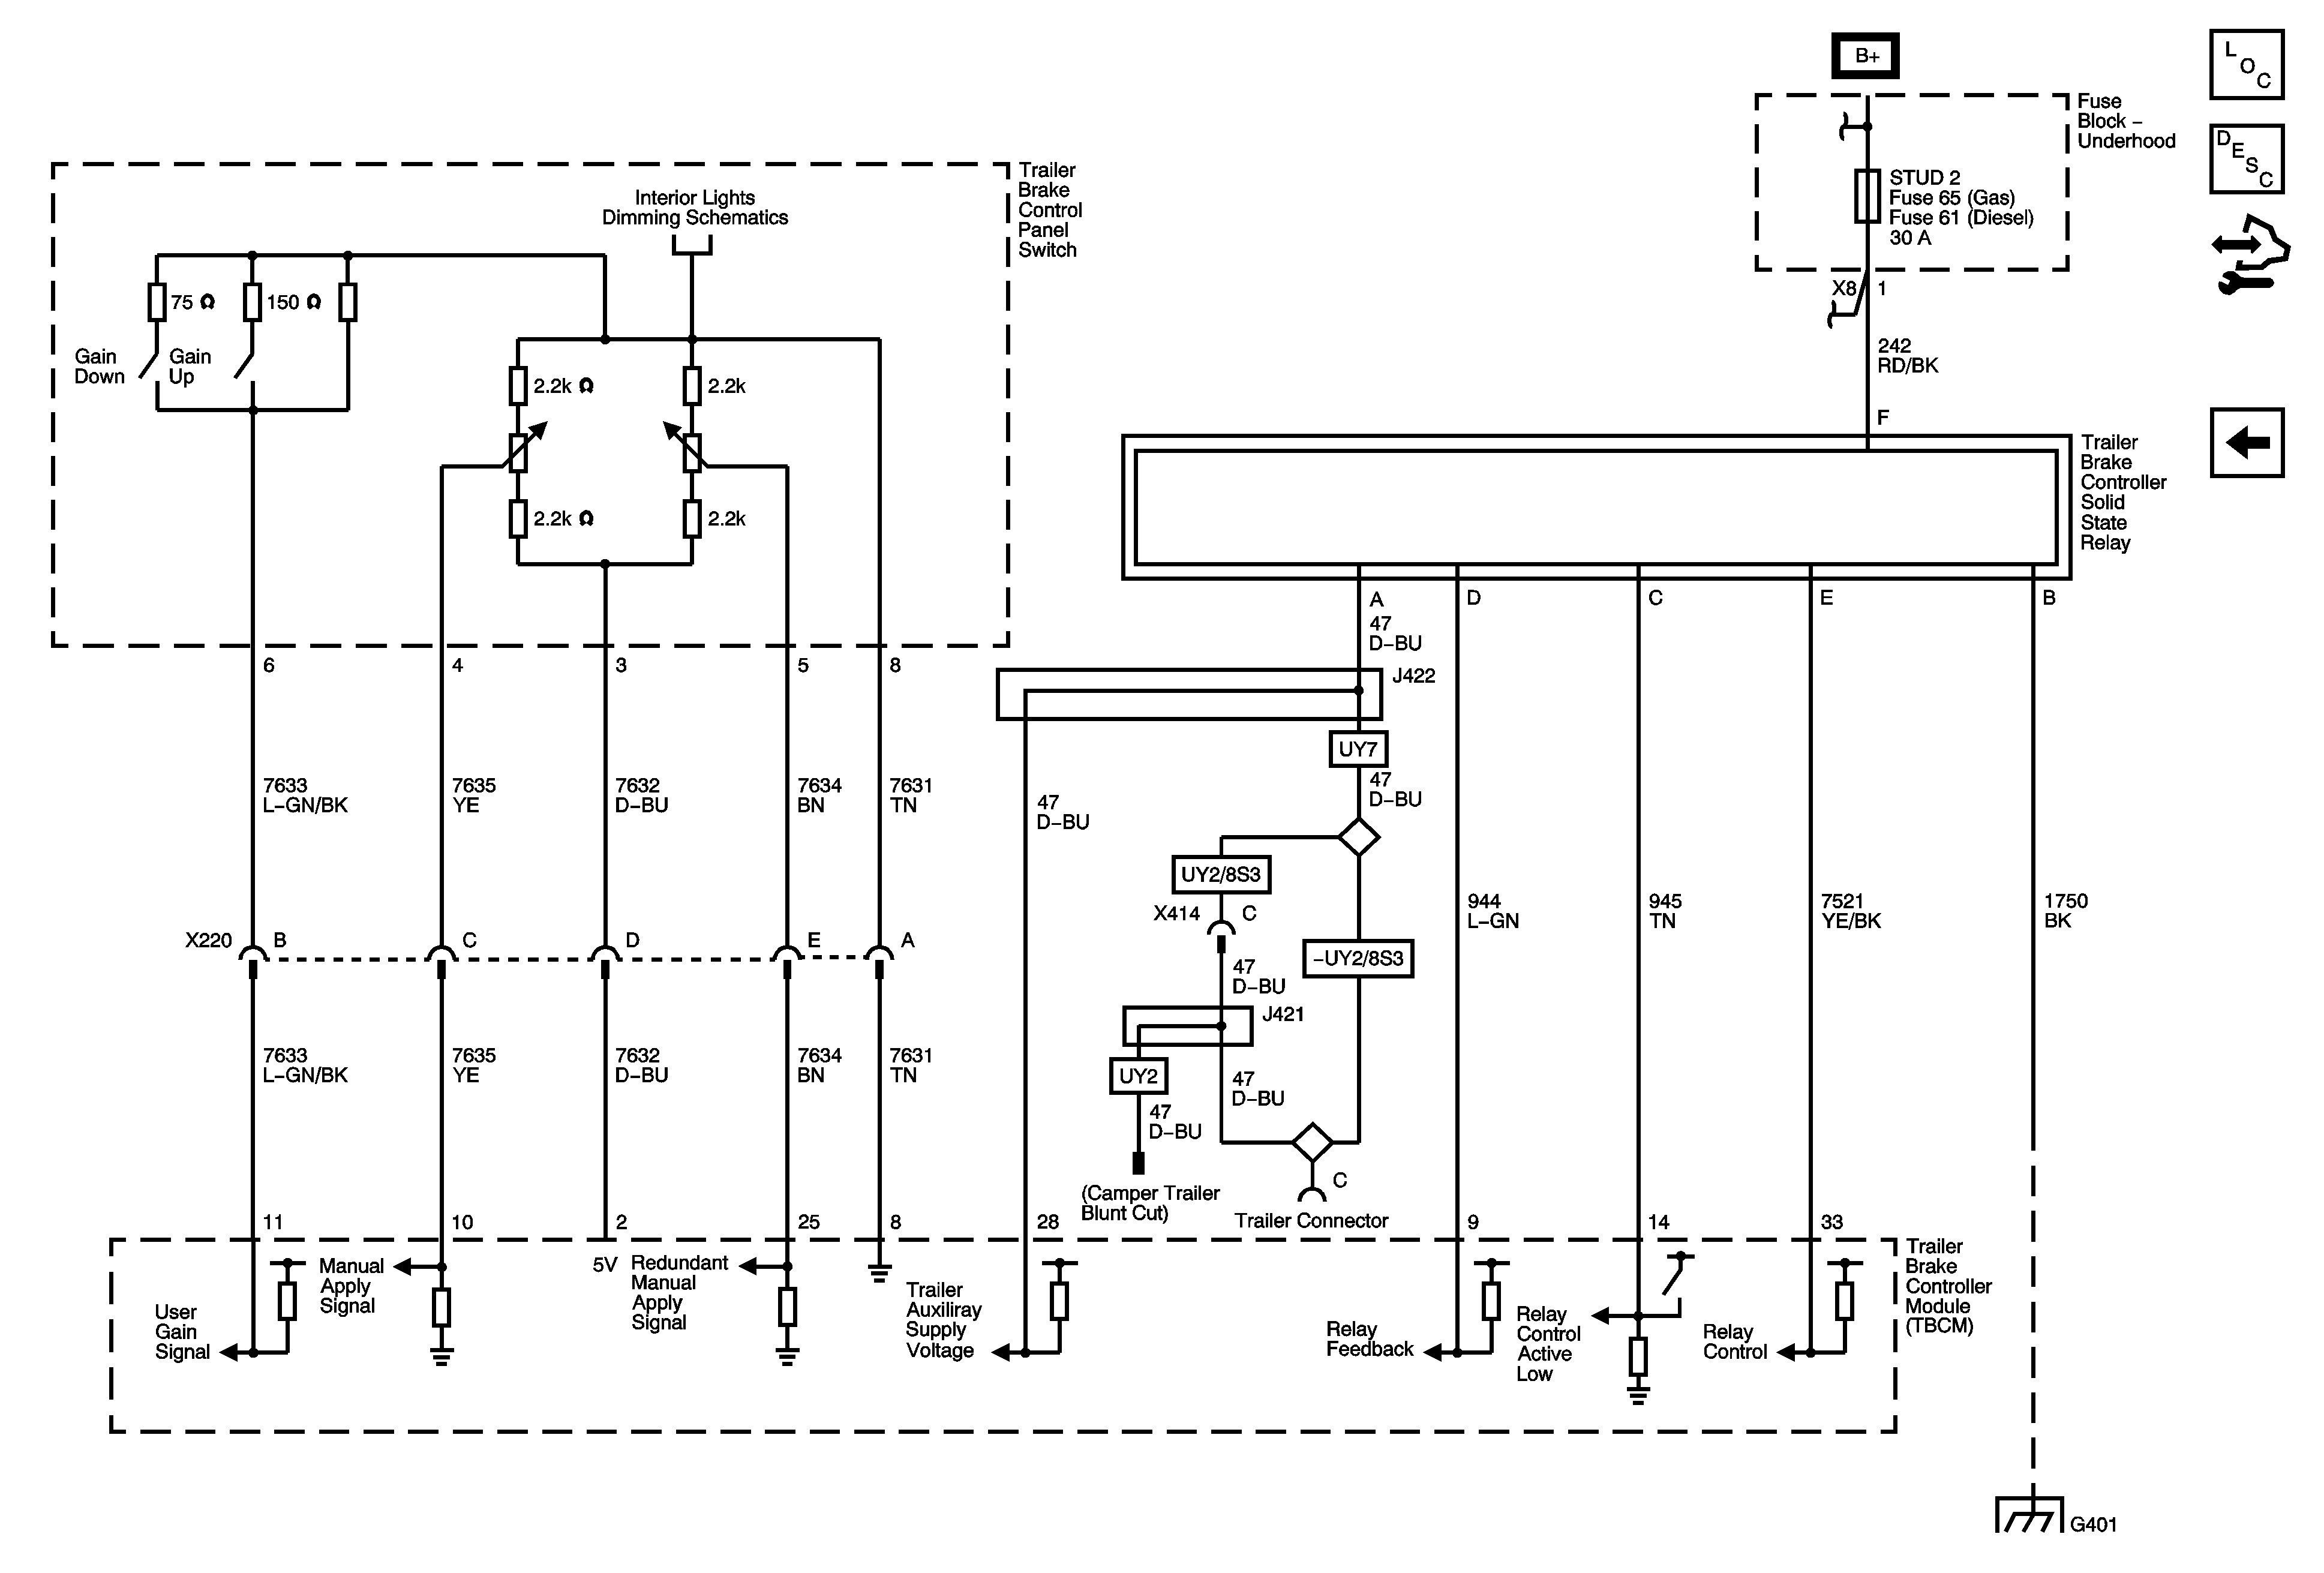 2005 Silverado Trailer Wiring Diagram New In 2020 Trailer Wiring Diagram 2005 Chevy Silverado Chevy Silverado